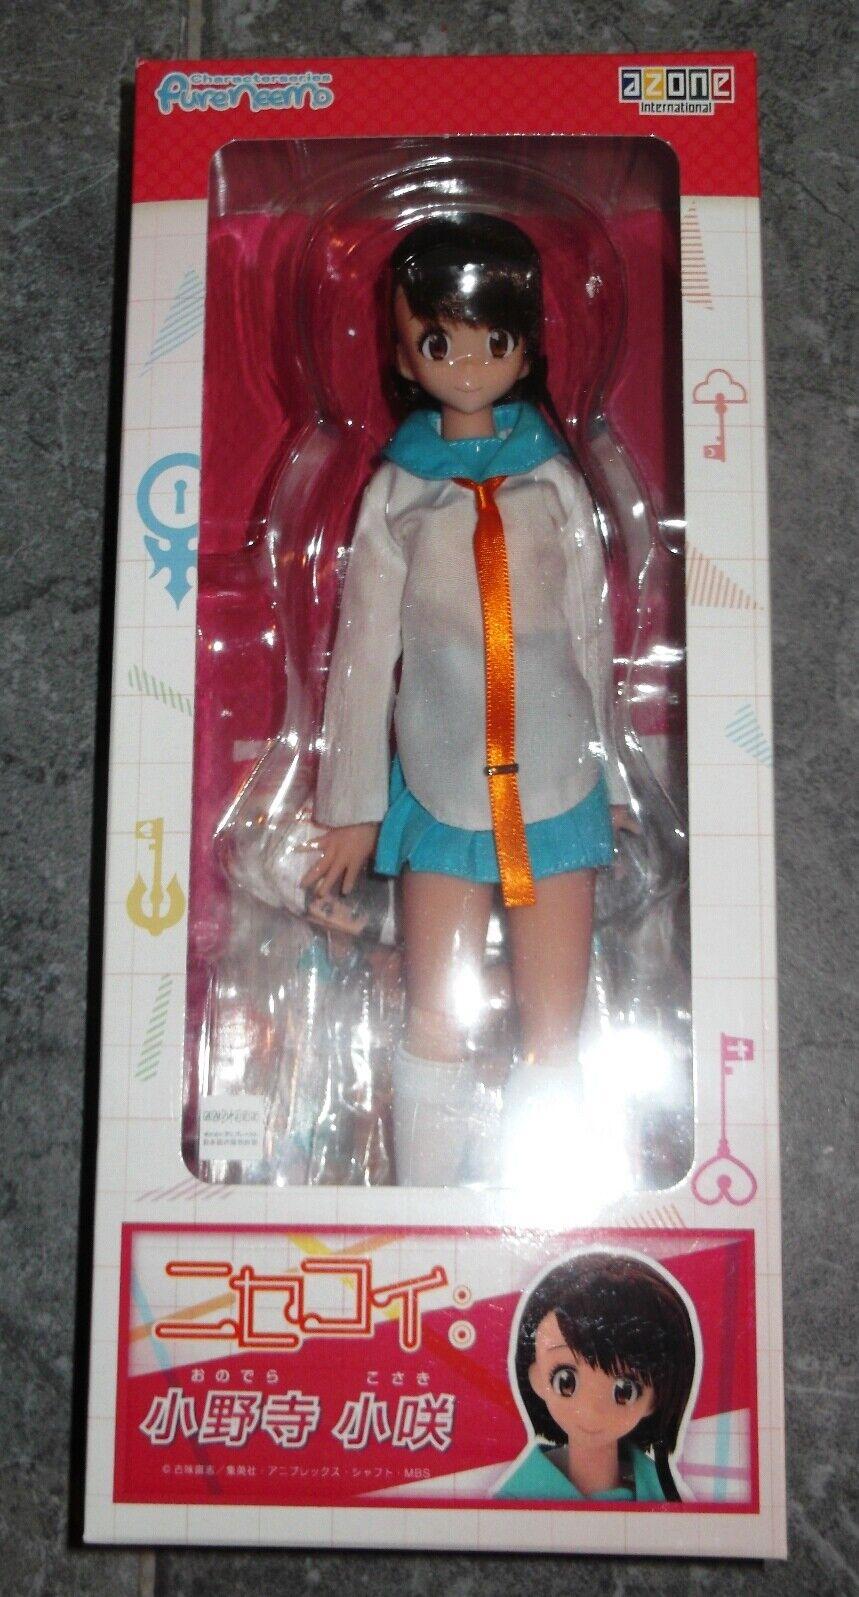 AZONE KOSAKI ONODERA Pure Neemo Nisekoi 1 6 Action Doll 92